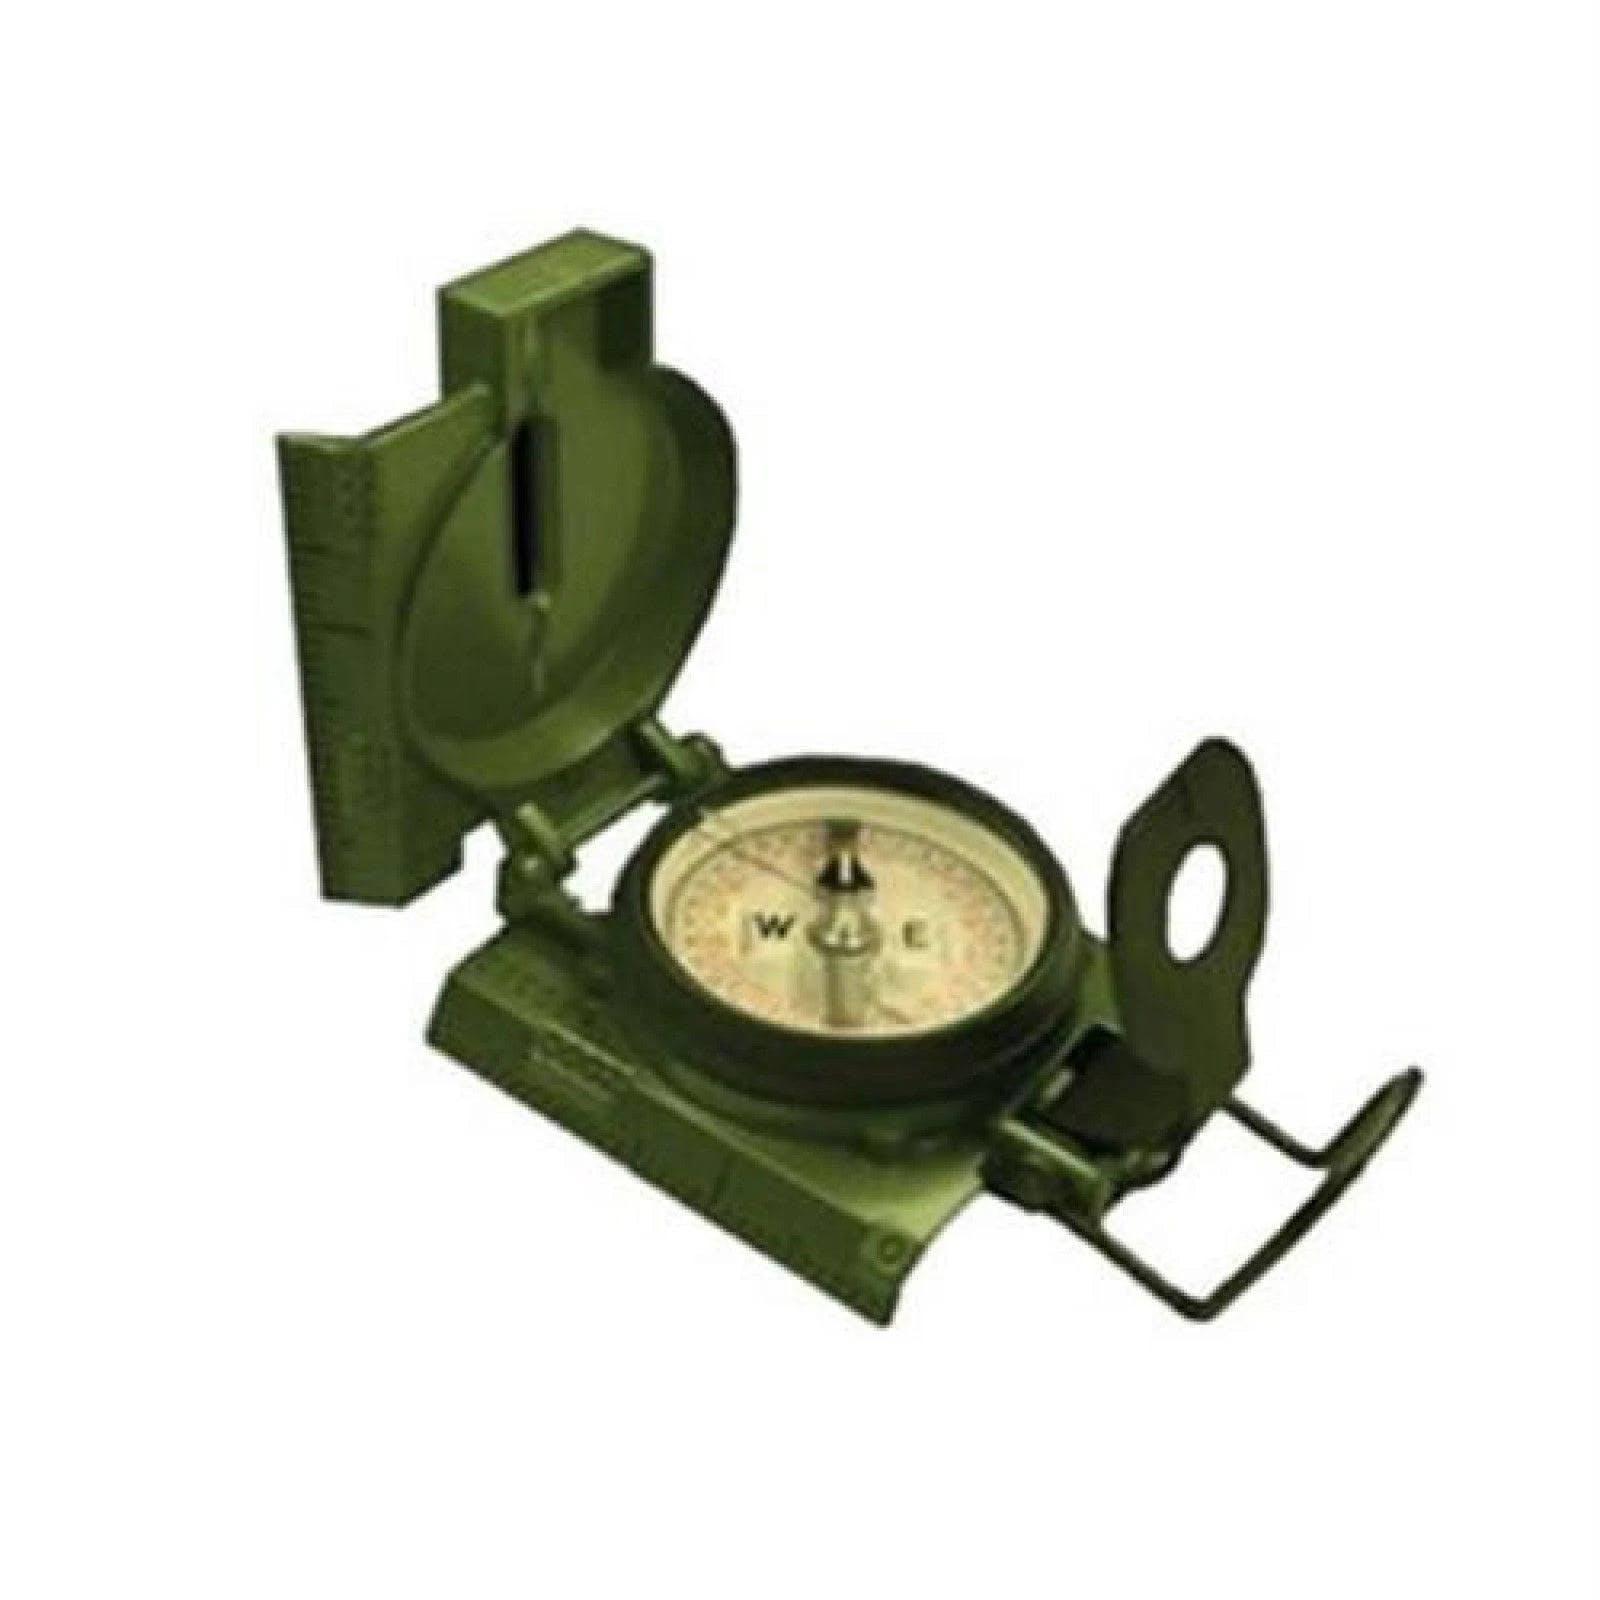 Cammenga S.W.A.T. Black Lensatic Compass Tritium